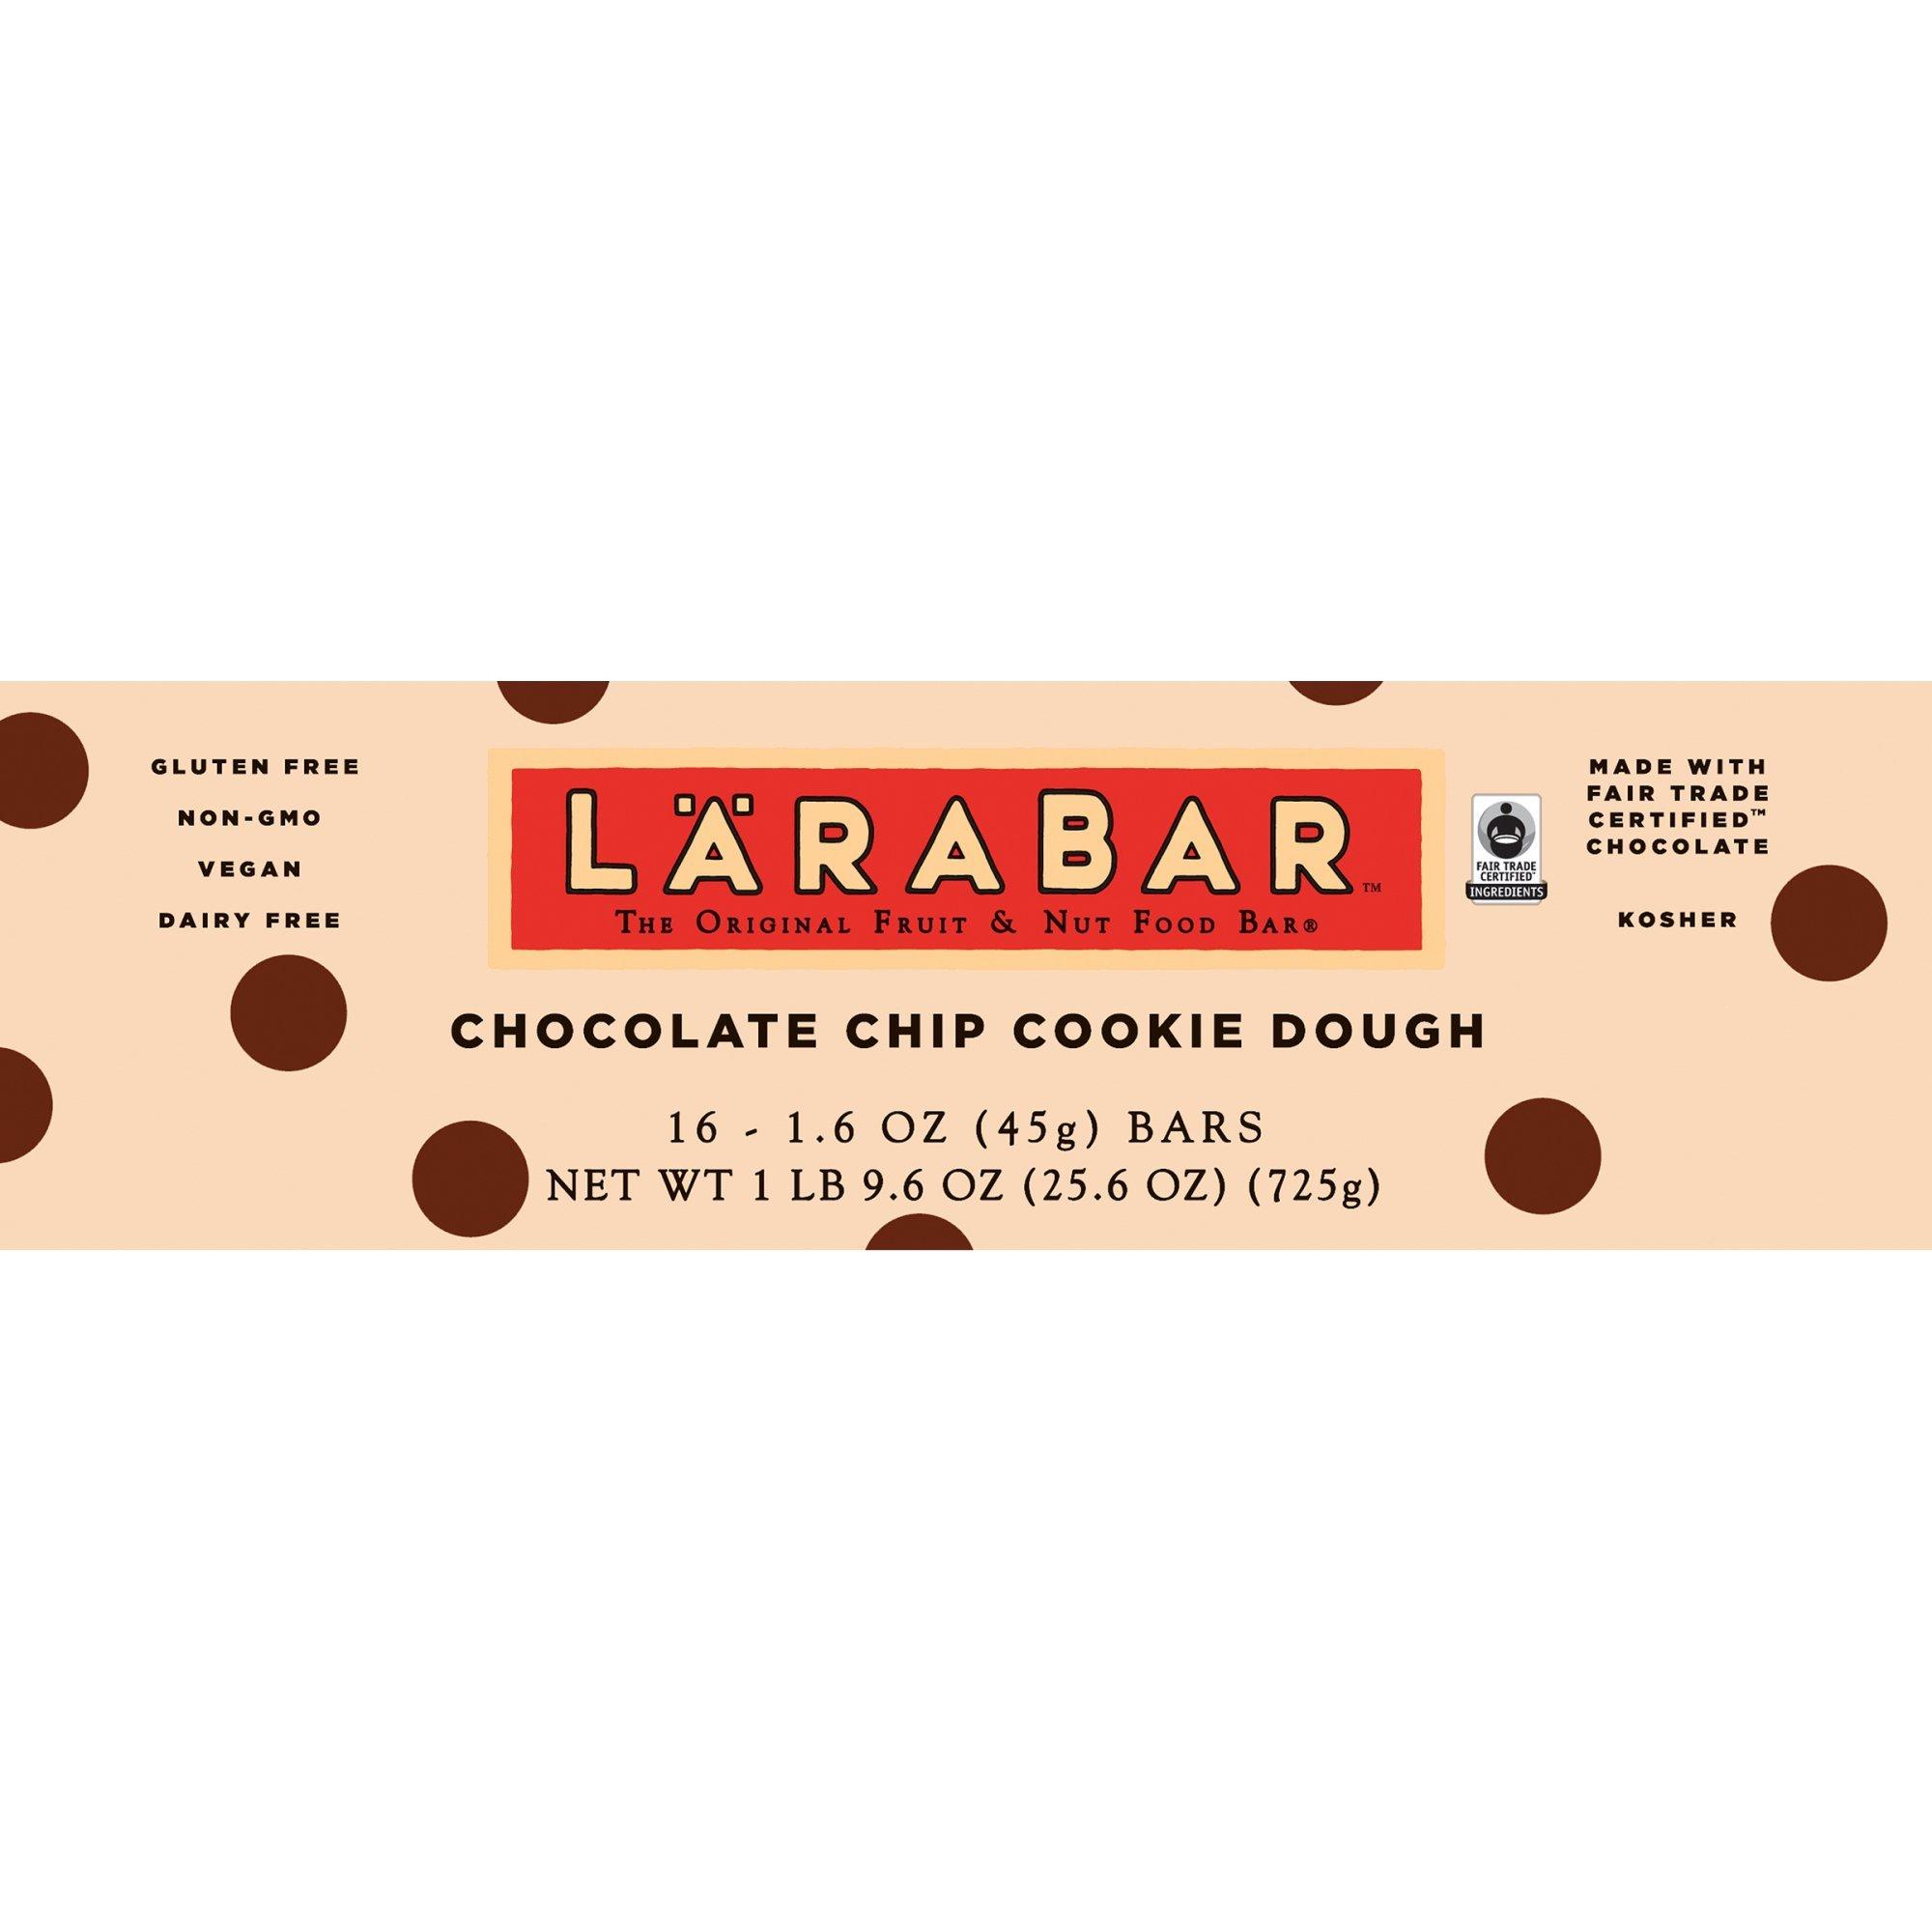 Lärabar Chocolate Chip Cookie Dough Fruit & Nut Bars 16 ct Box (Pack of 5) by Larabar (Image #5)